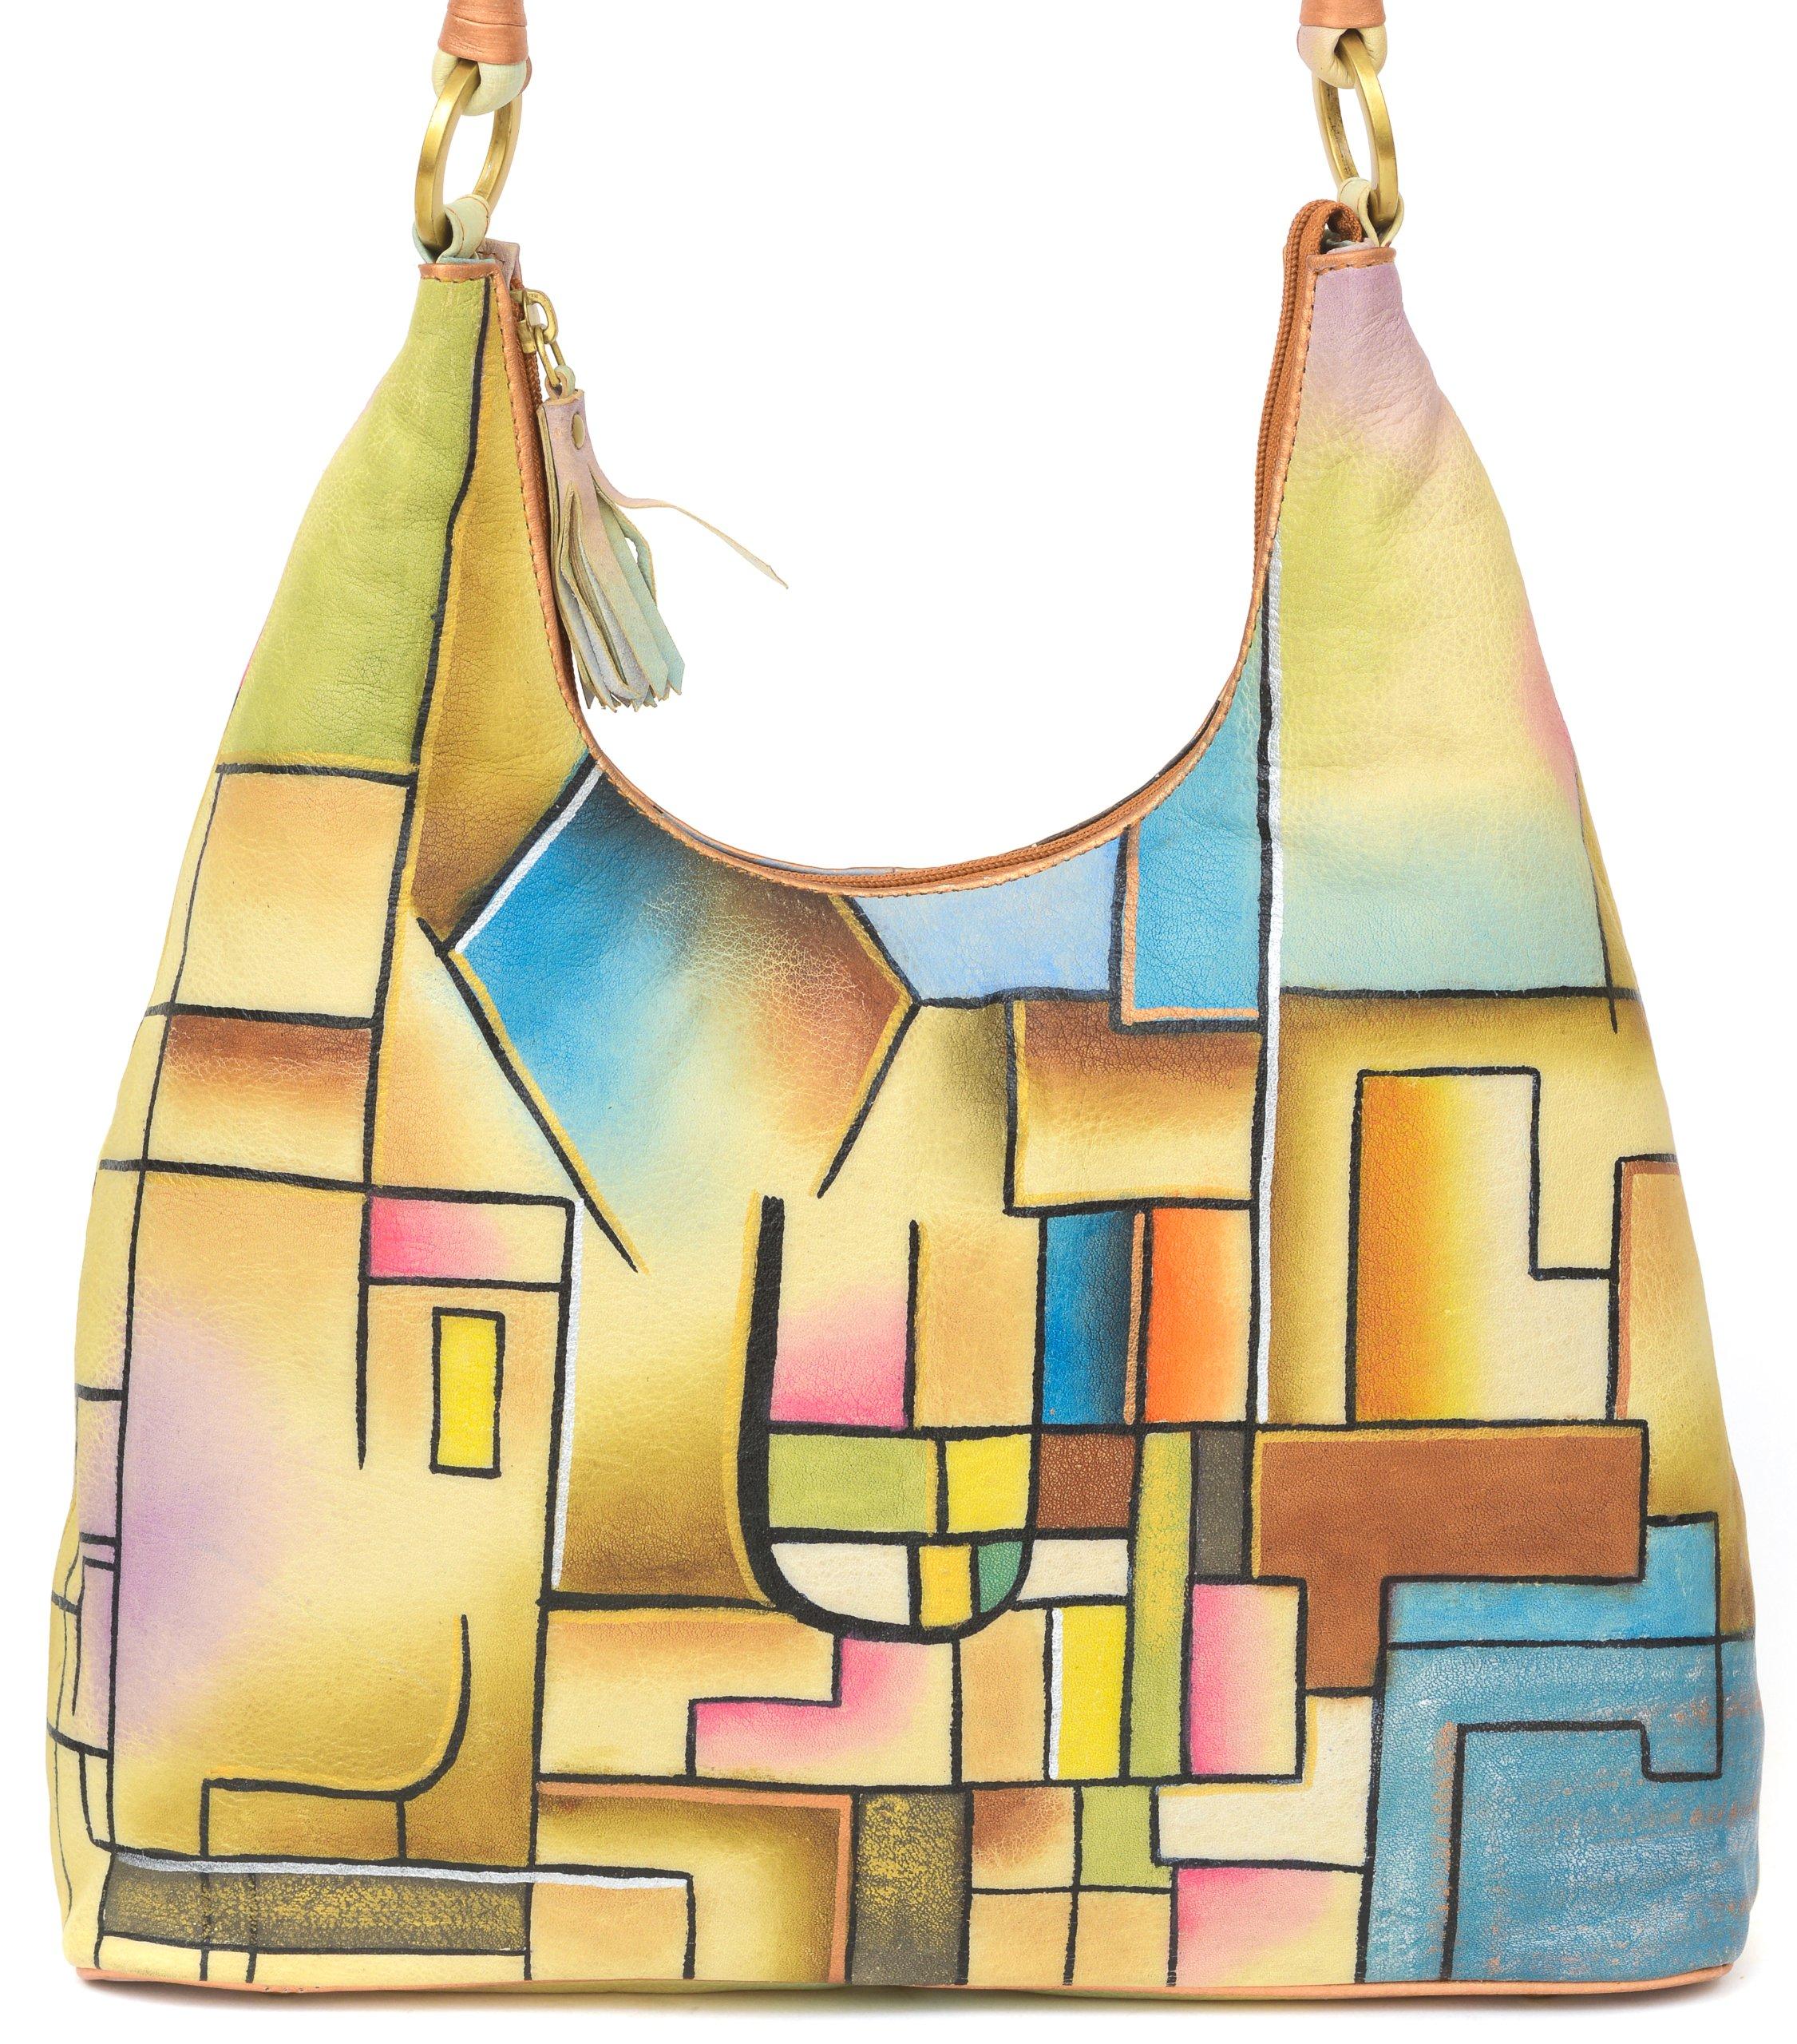 ZIMBELMANN SELINA Genuine Nappa Leather Hand-painted Hobo Shoulder Bag